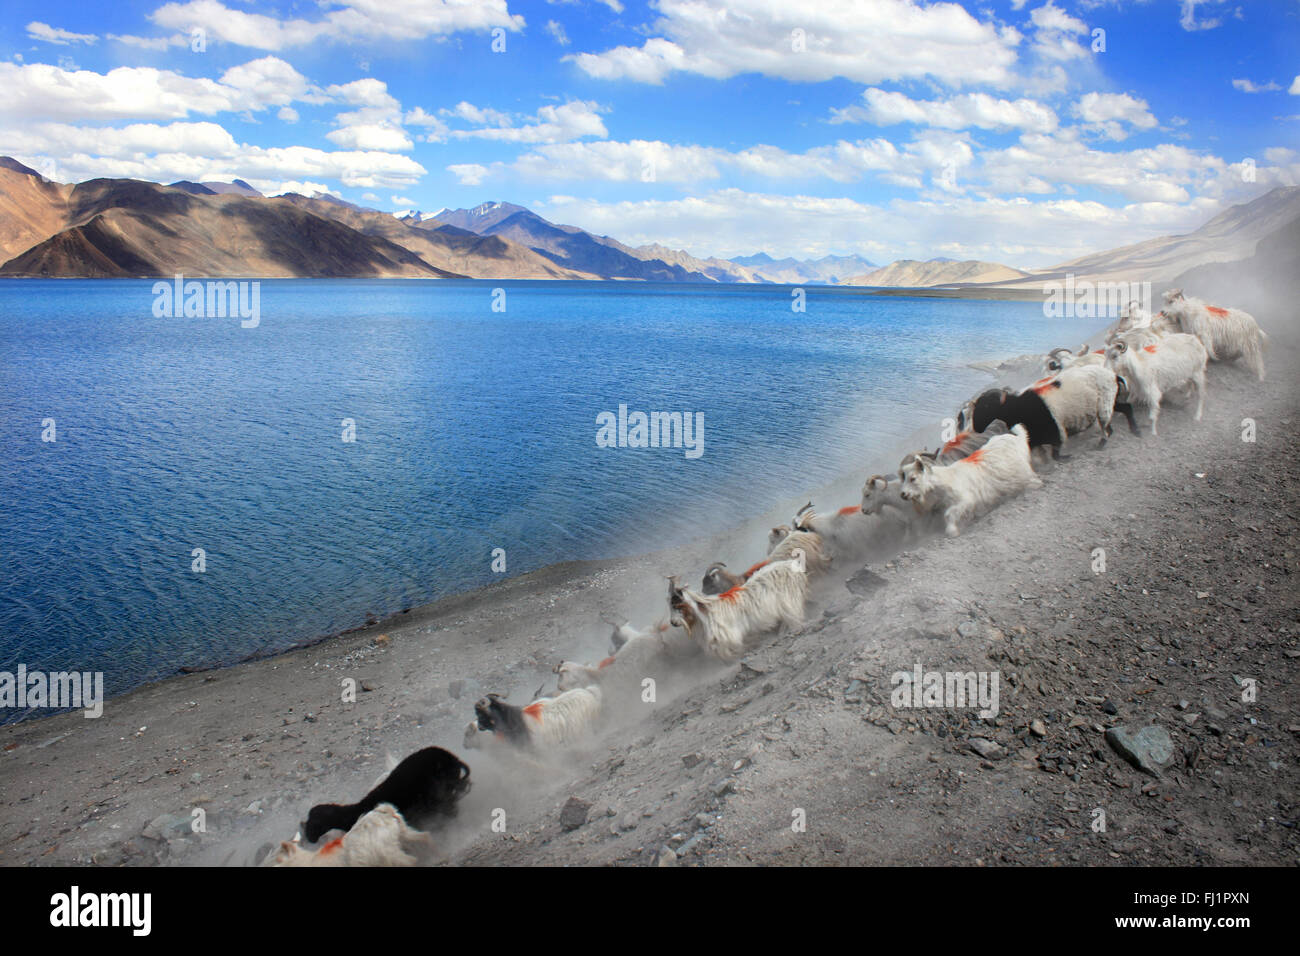 Les chèvres à Pangong Tso , paysage de l'Himalaya Ladakh , , Inde Photo Stock